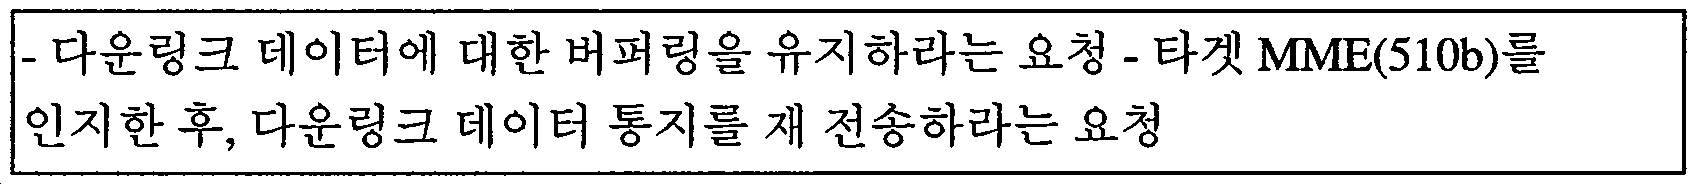 Figure 112015022361790-pct00010